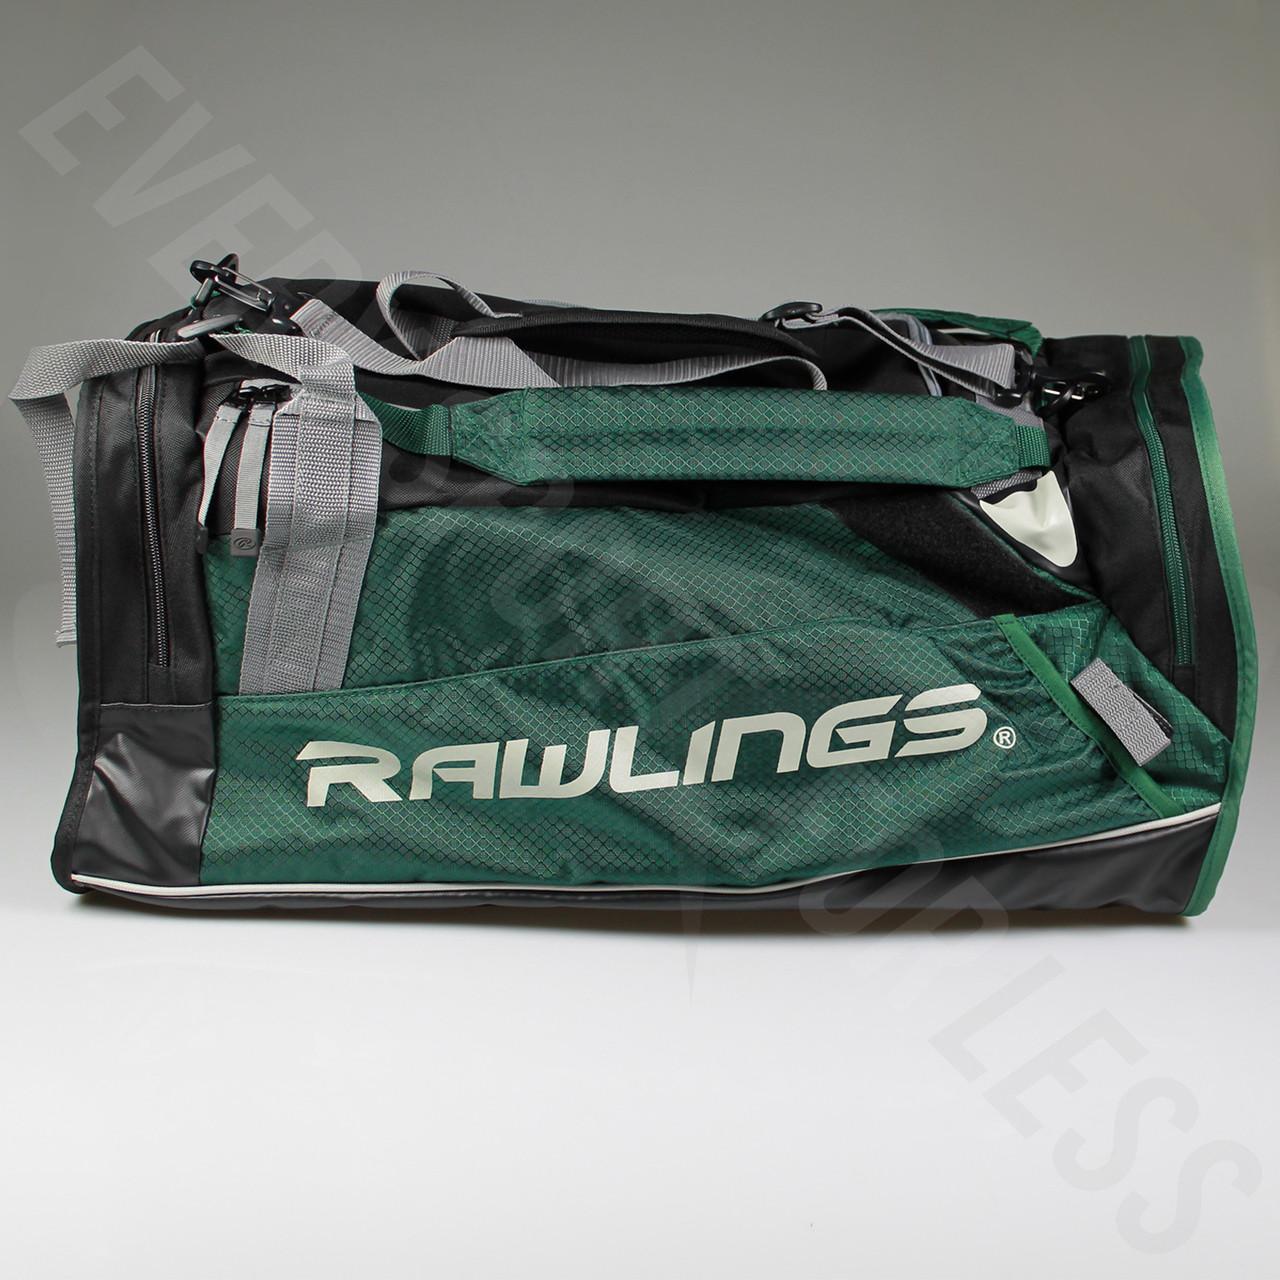 88d8582e84 ... Rawlings R601 Hybrid Baseball Backpack   Duffel Bag